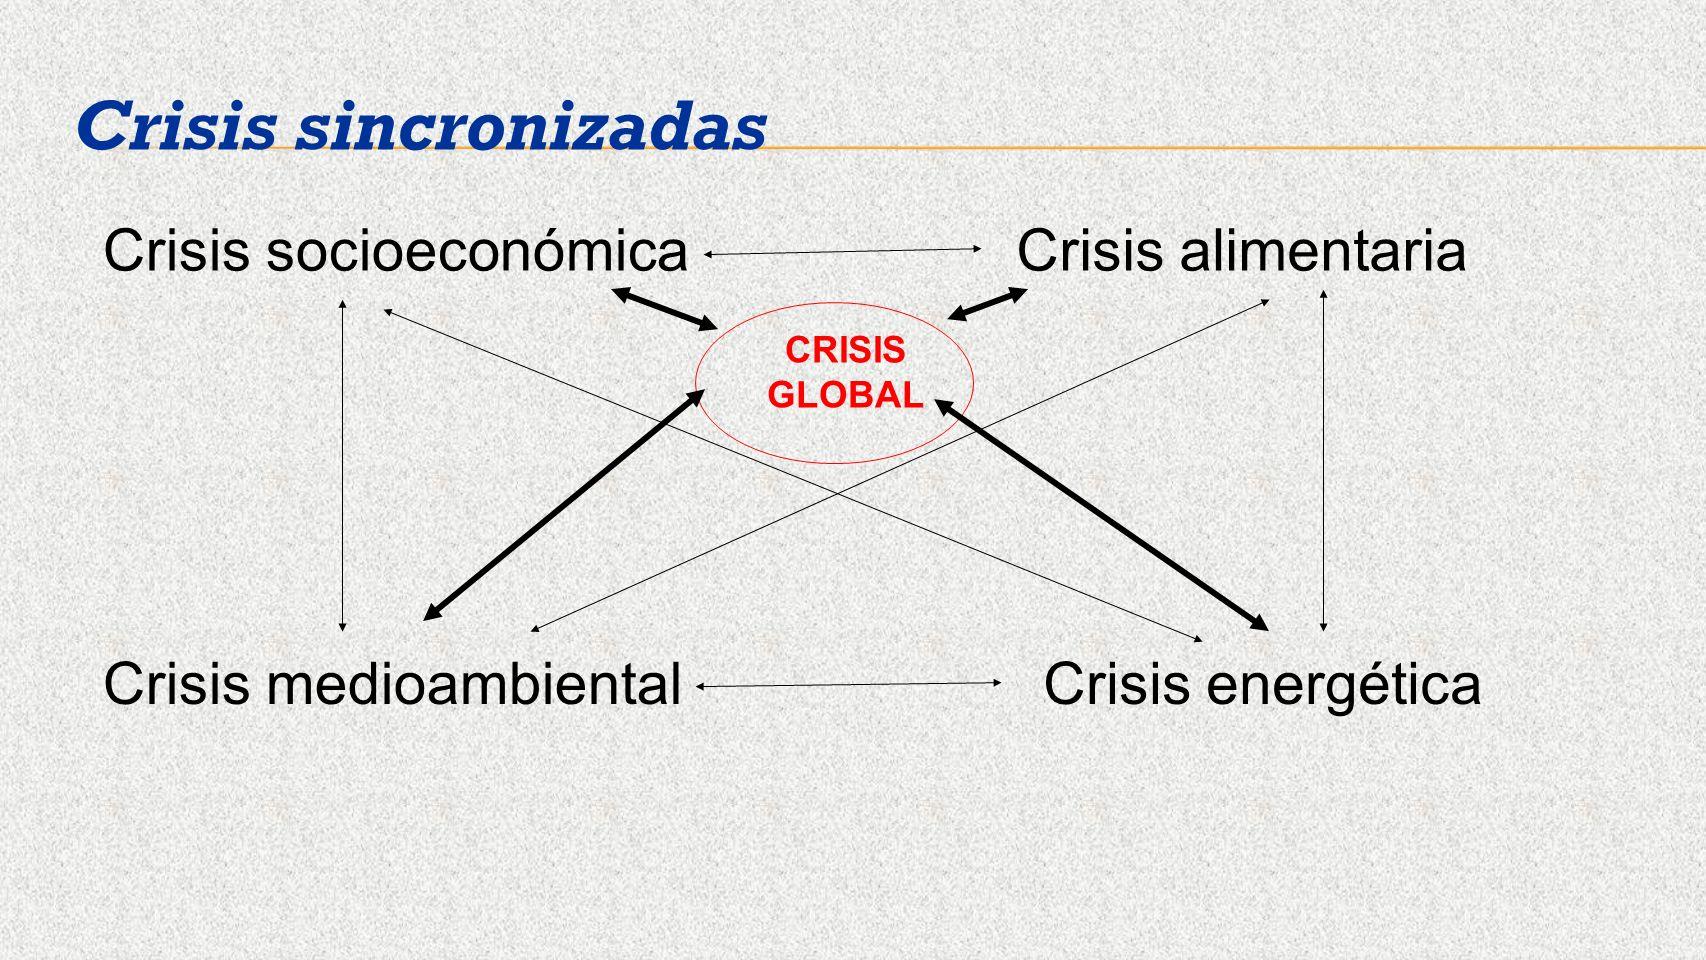 Crisis socioeconómicaCrisis alimentaria Crisis medioambientalCrisis energética Crisis sincronizadas CRISIS GLOBAL